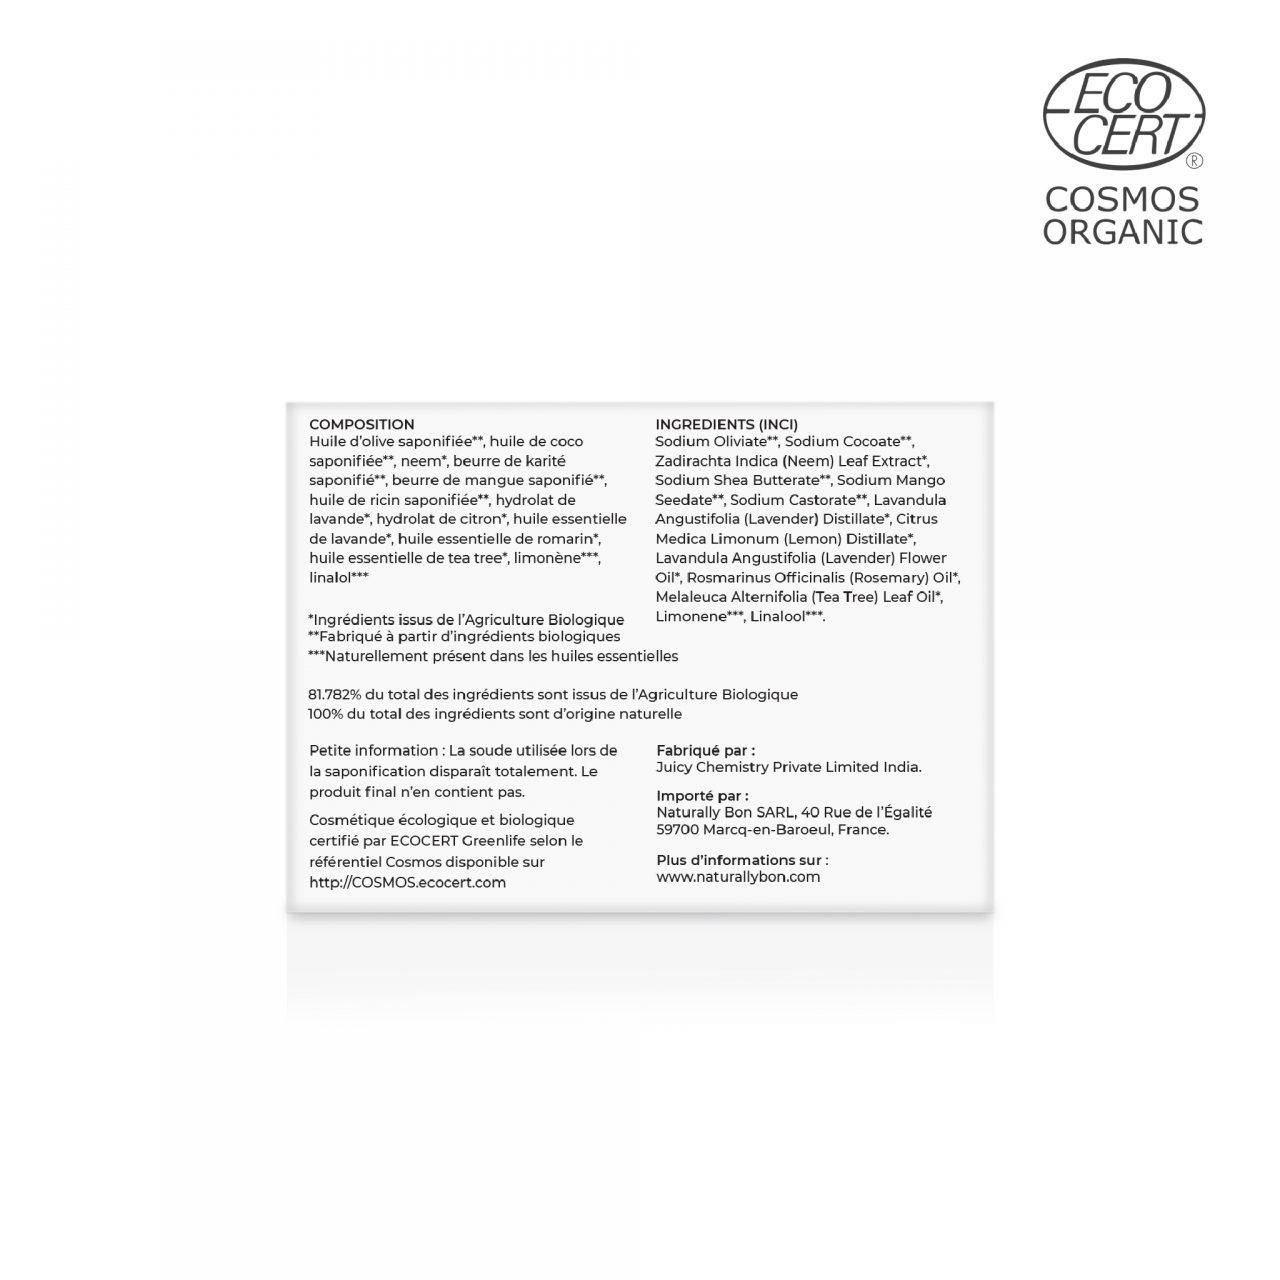 Savon-Shampooing Solide-Pain de Rasage Tea Tree, Neem & Romarin Composition_1